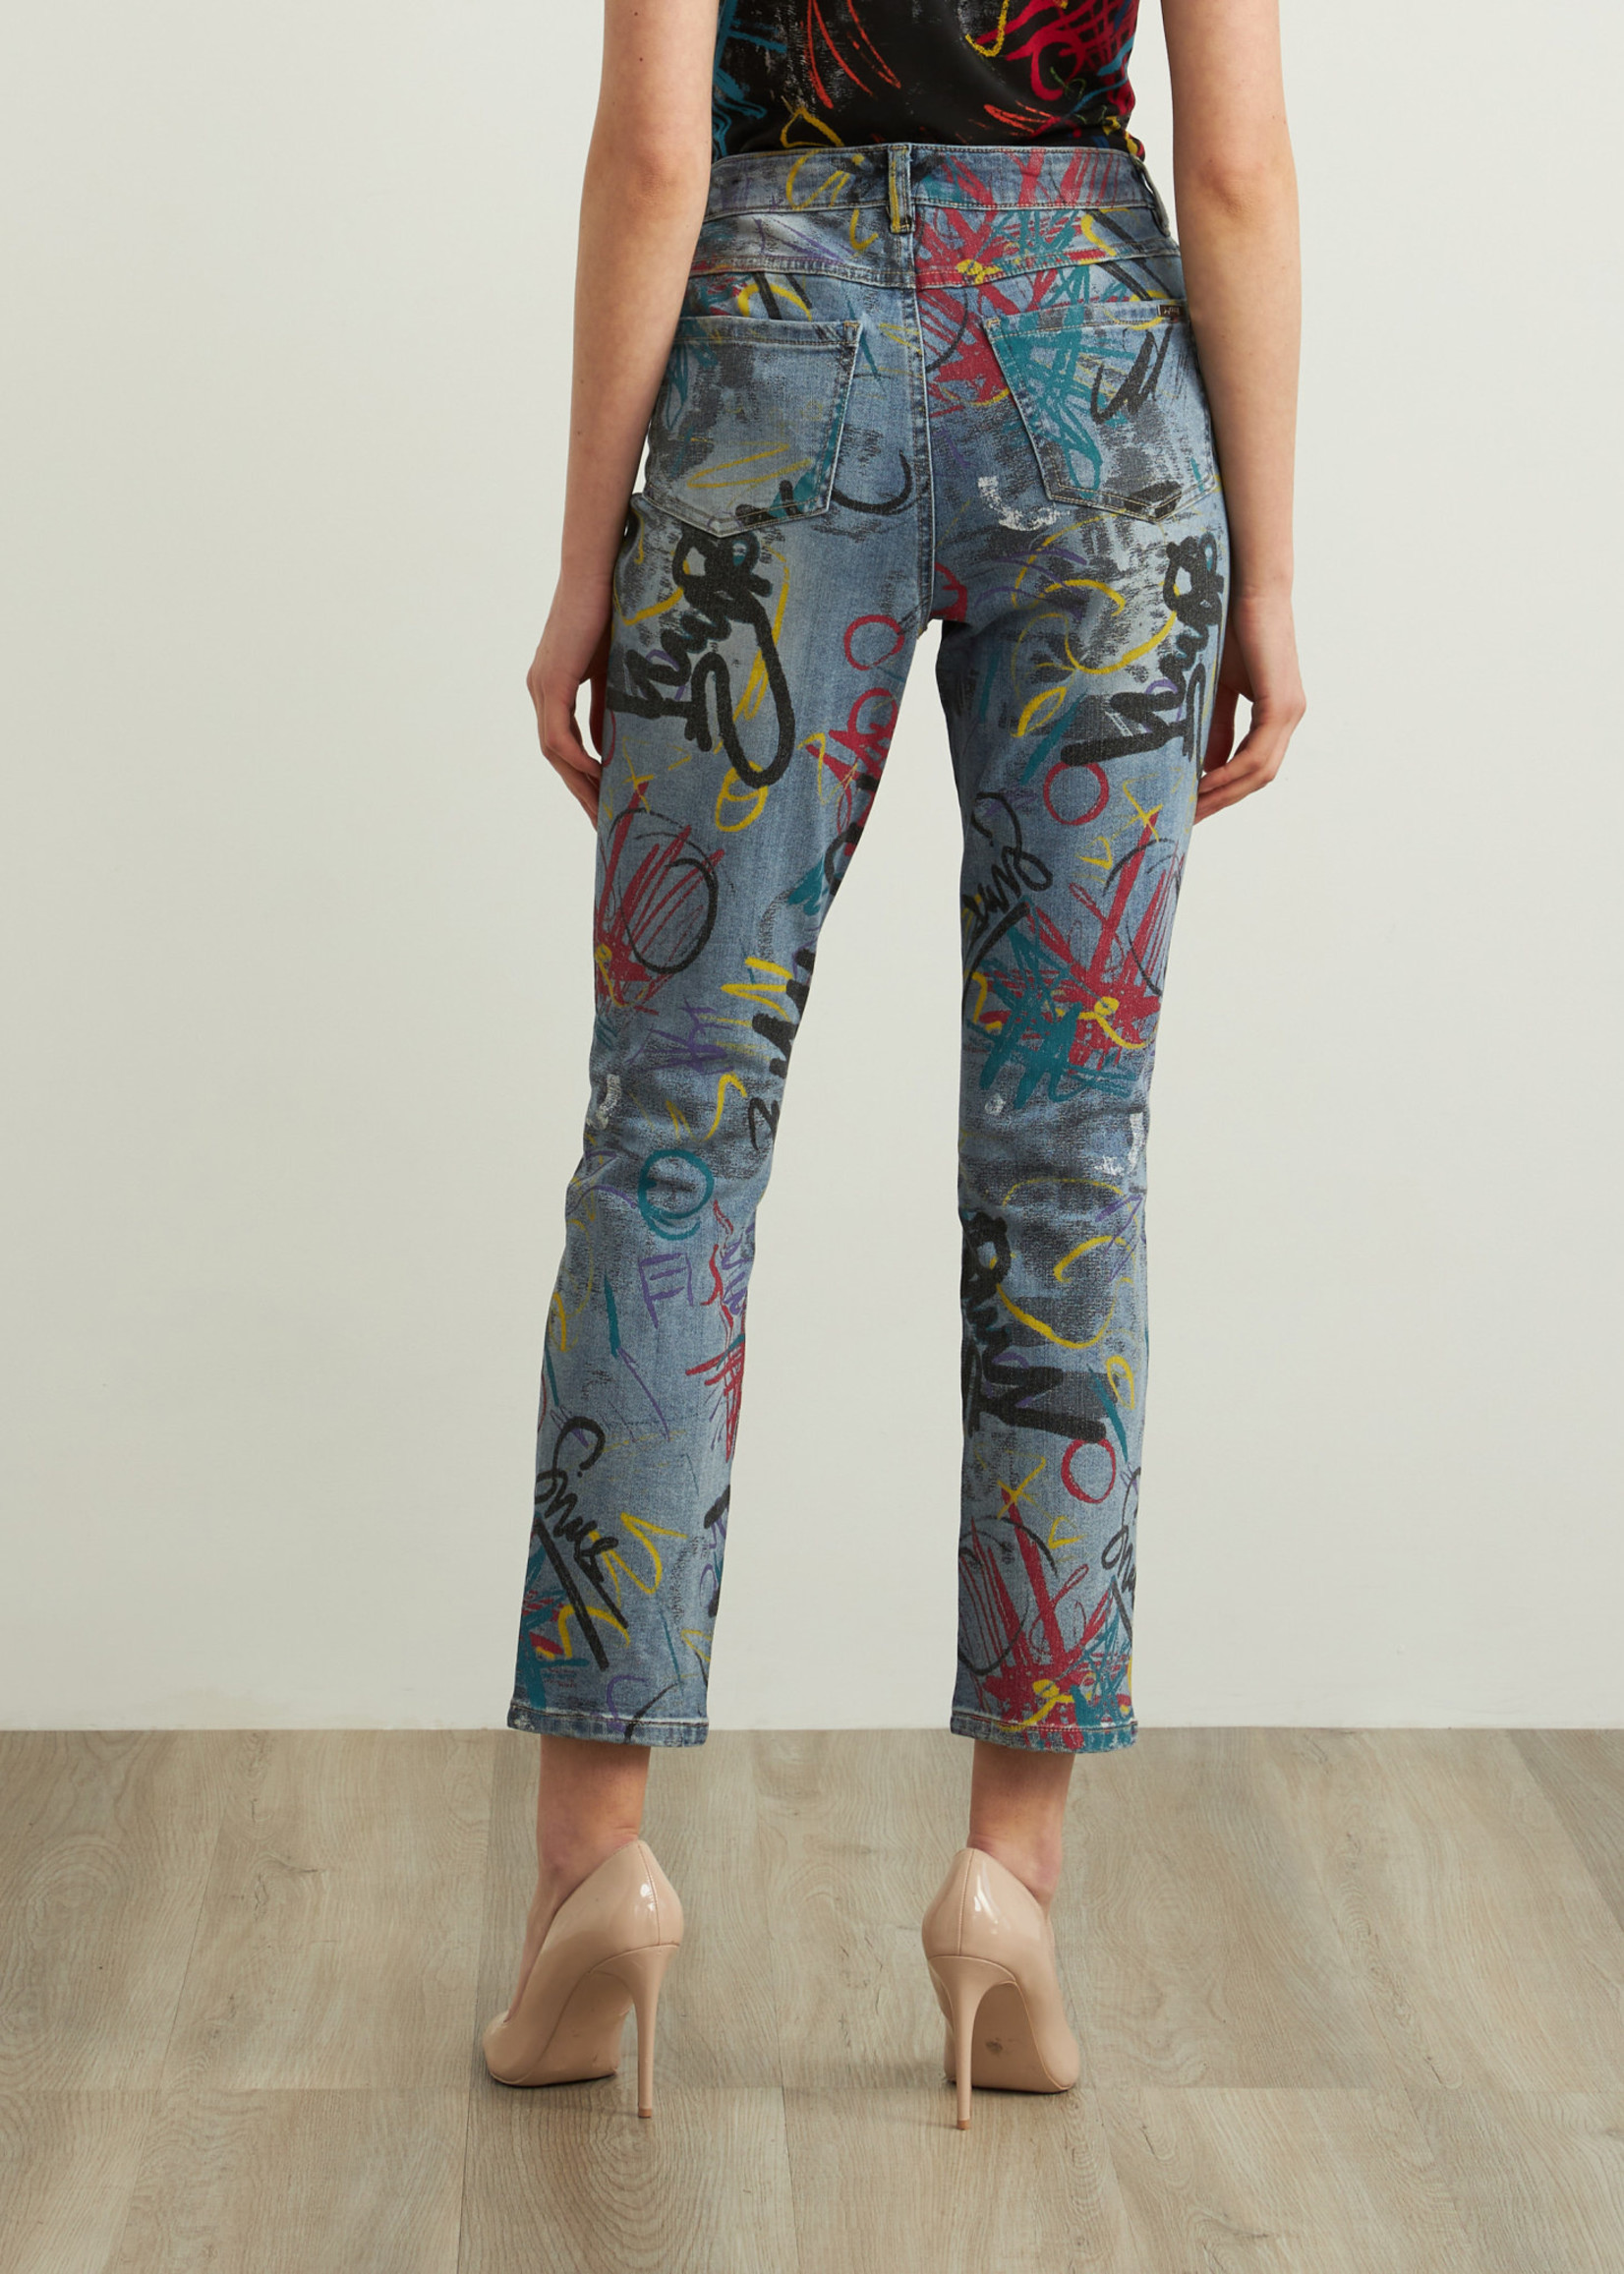 Joseph Ribkoff Joseph Ribkoff Graffiti Slim Leg Jeans